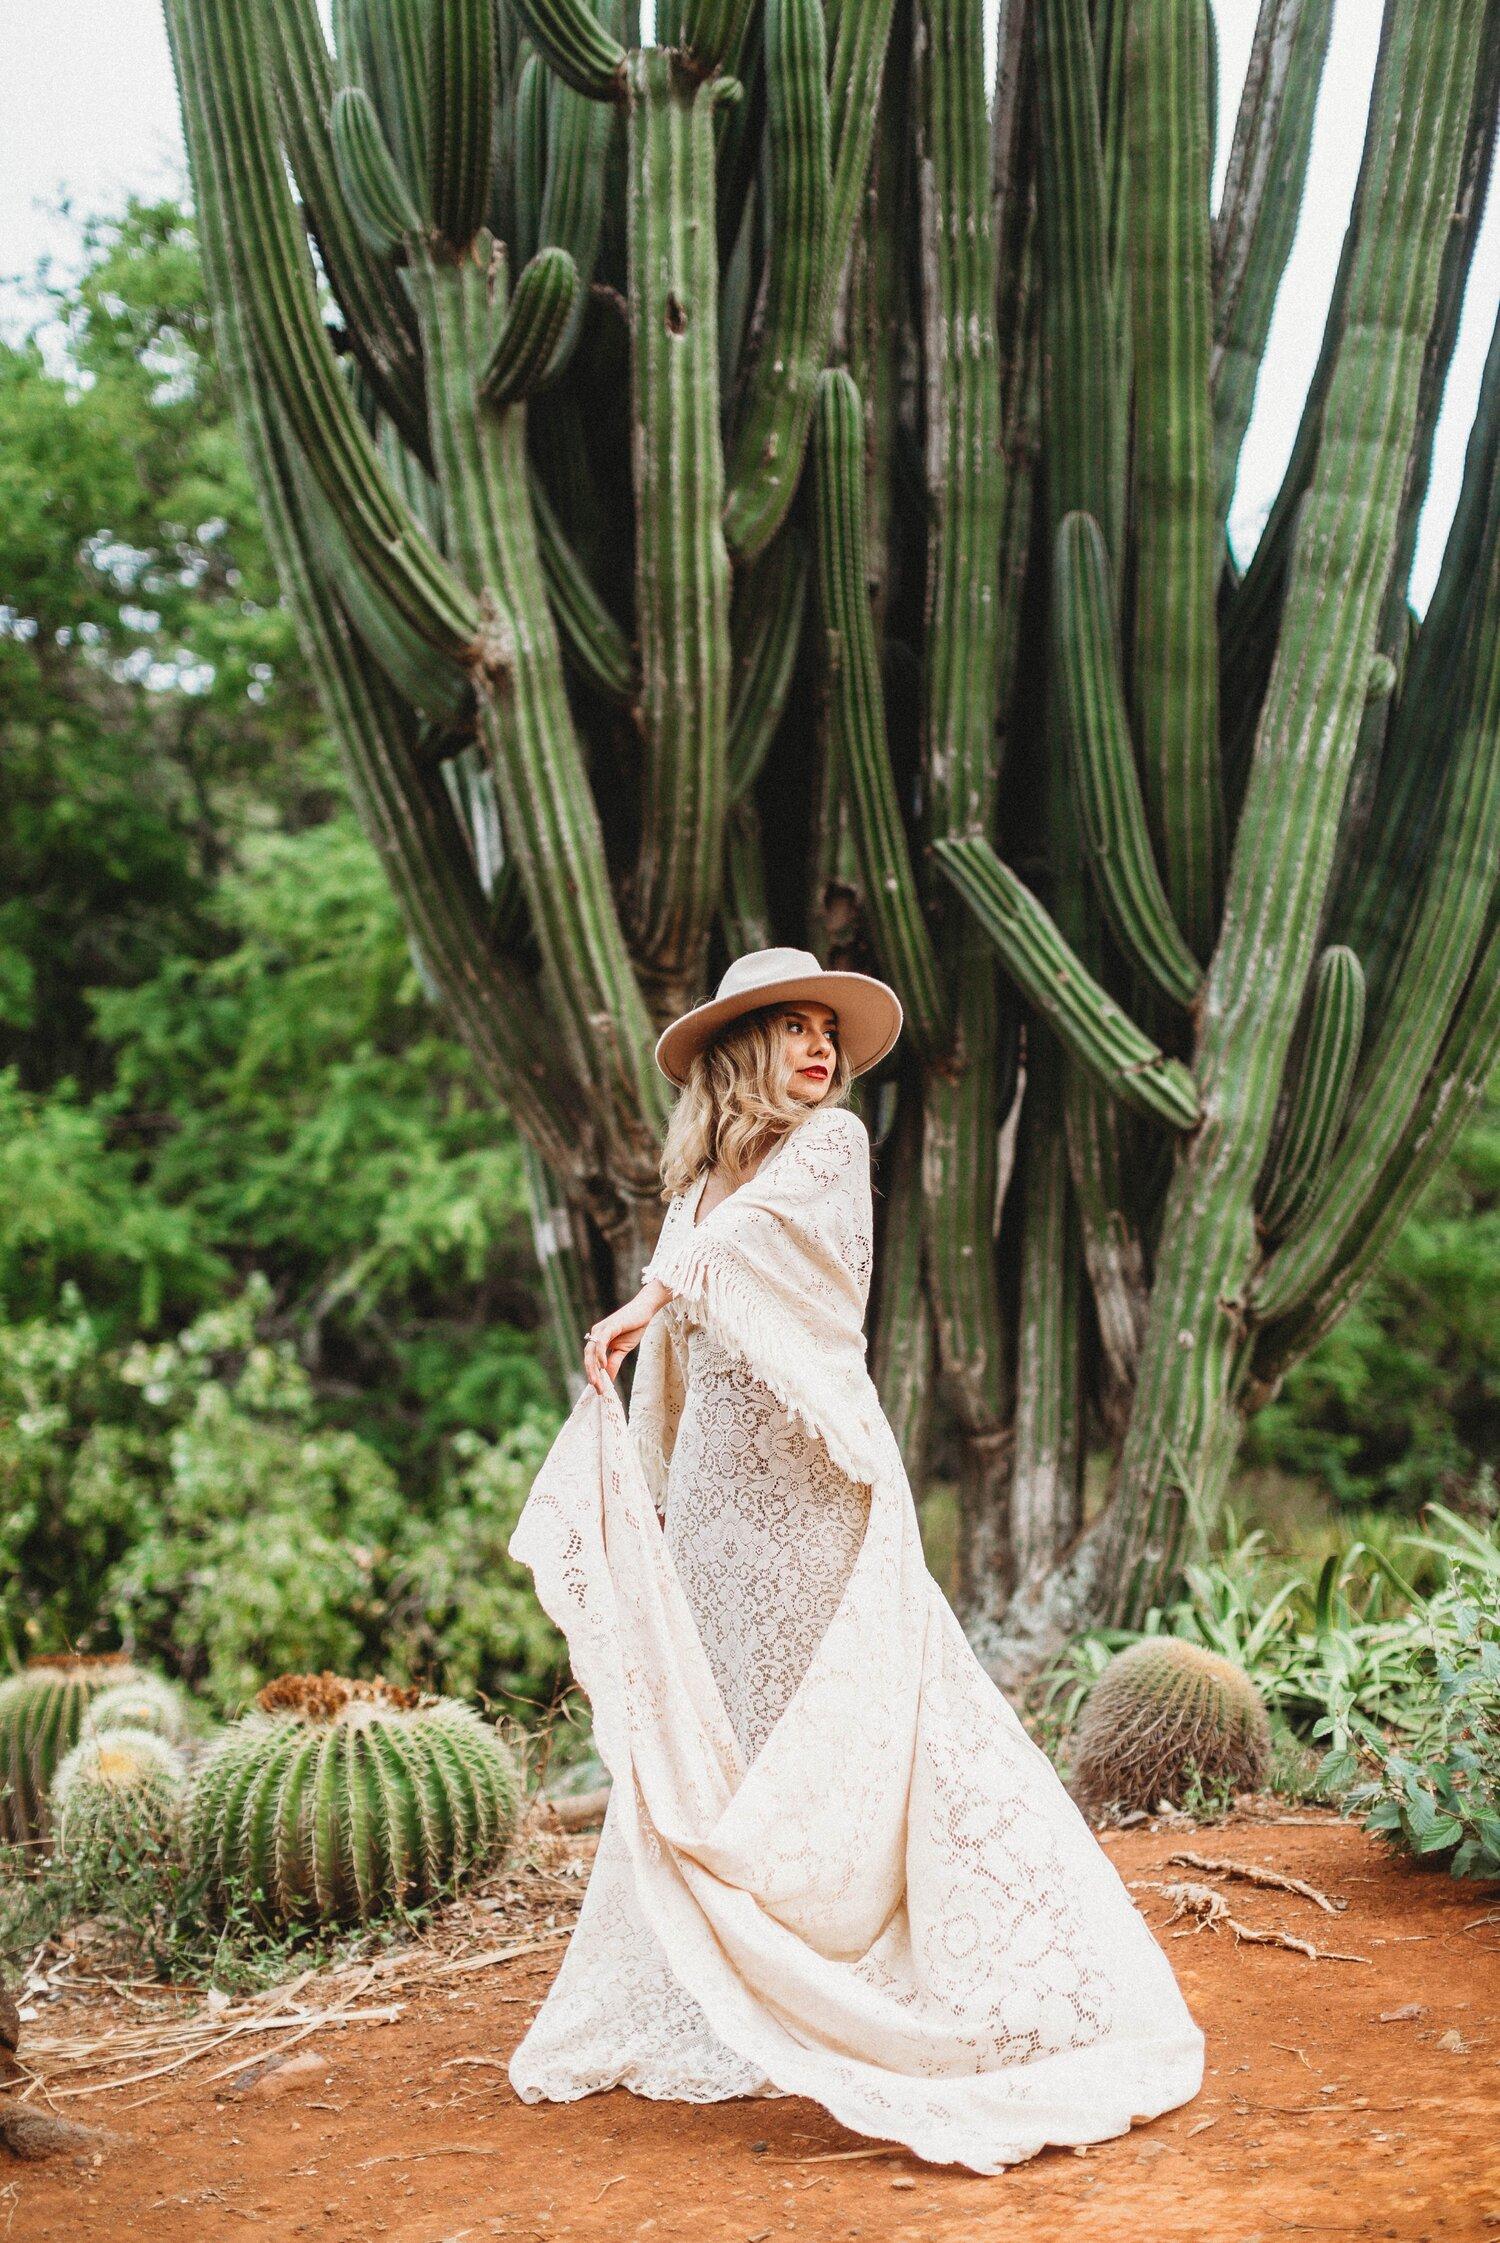 Boho Cactus Elopement - Honolulu, Koko Crater Botanical Garden - Oahu Hawaii Wedding Photographer 20.jpg